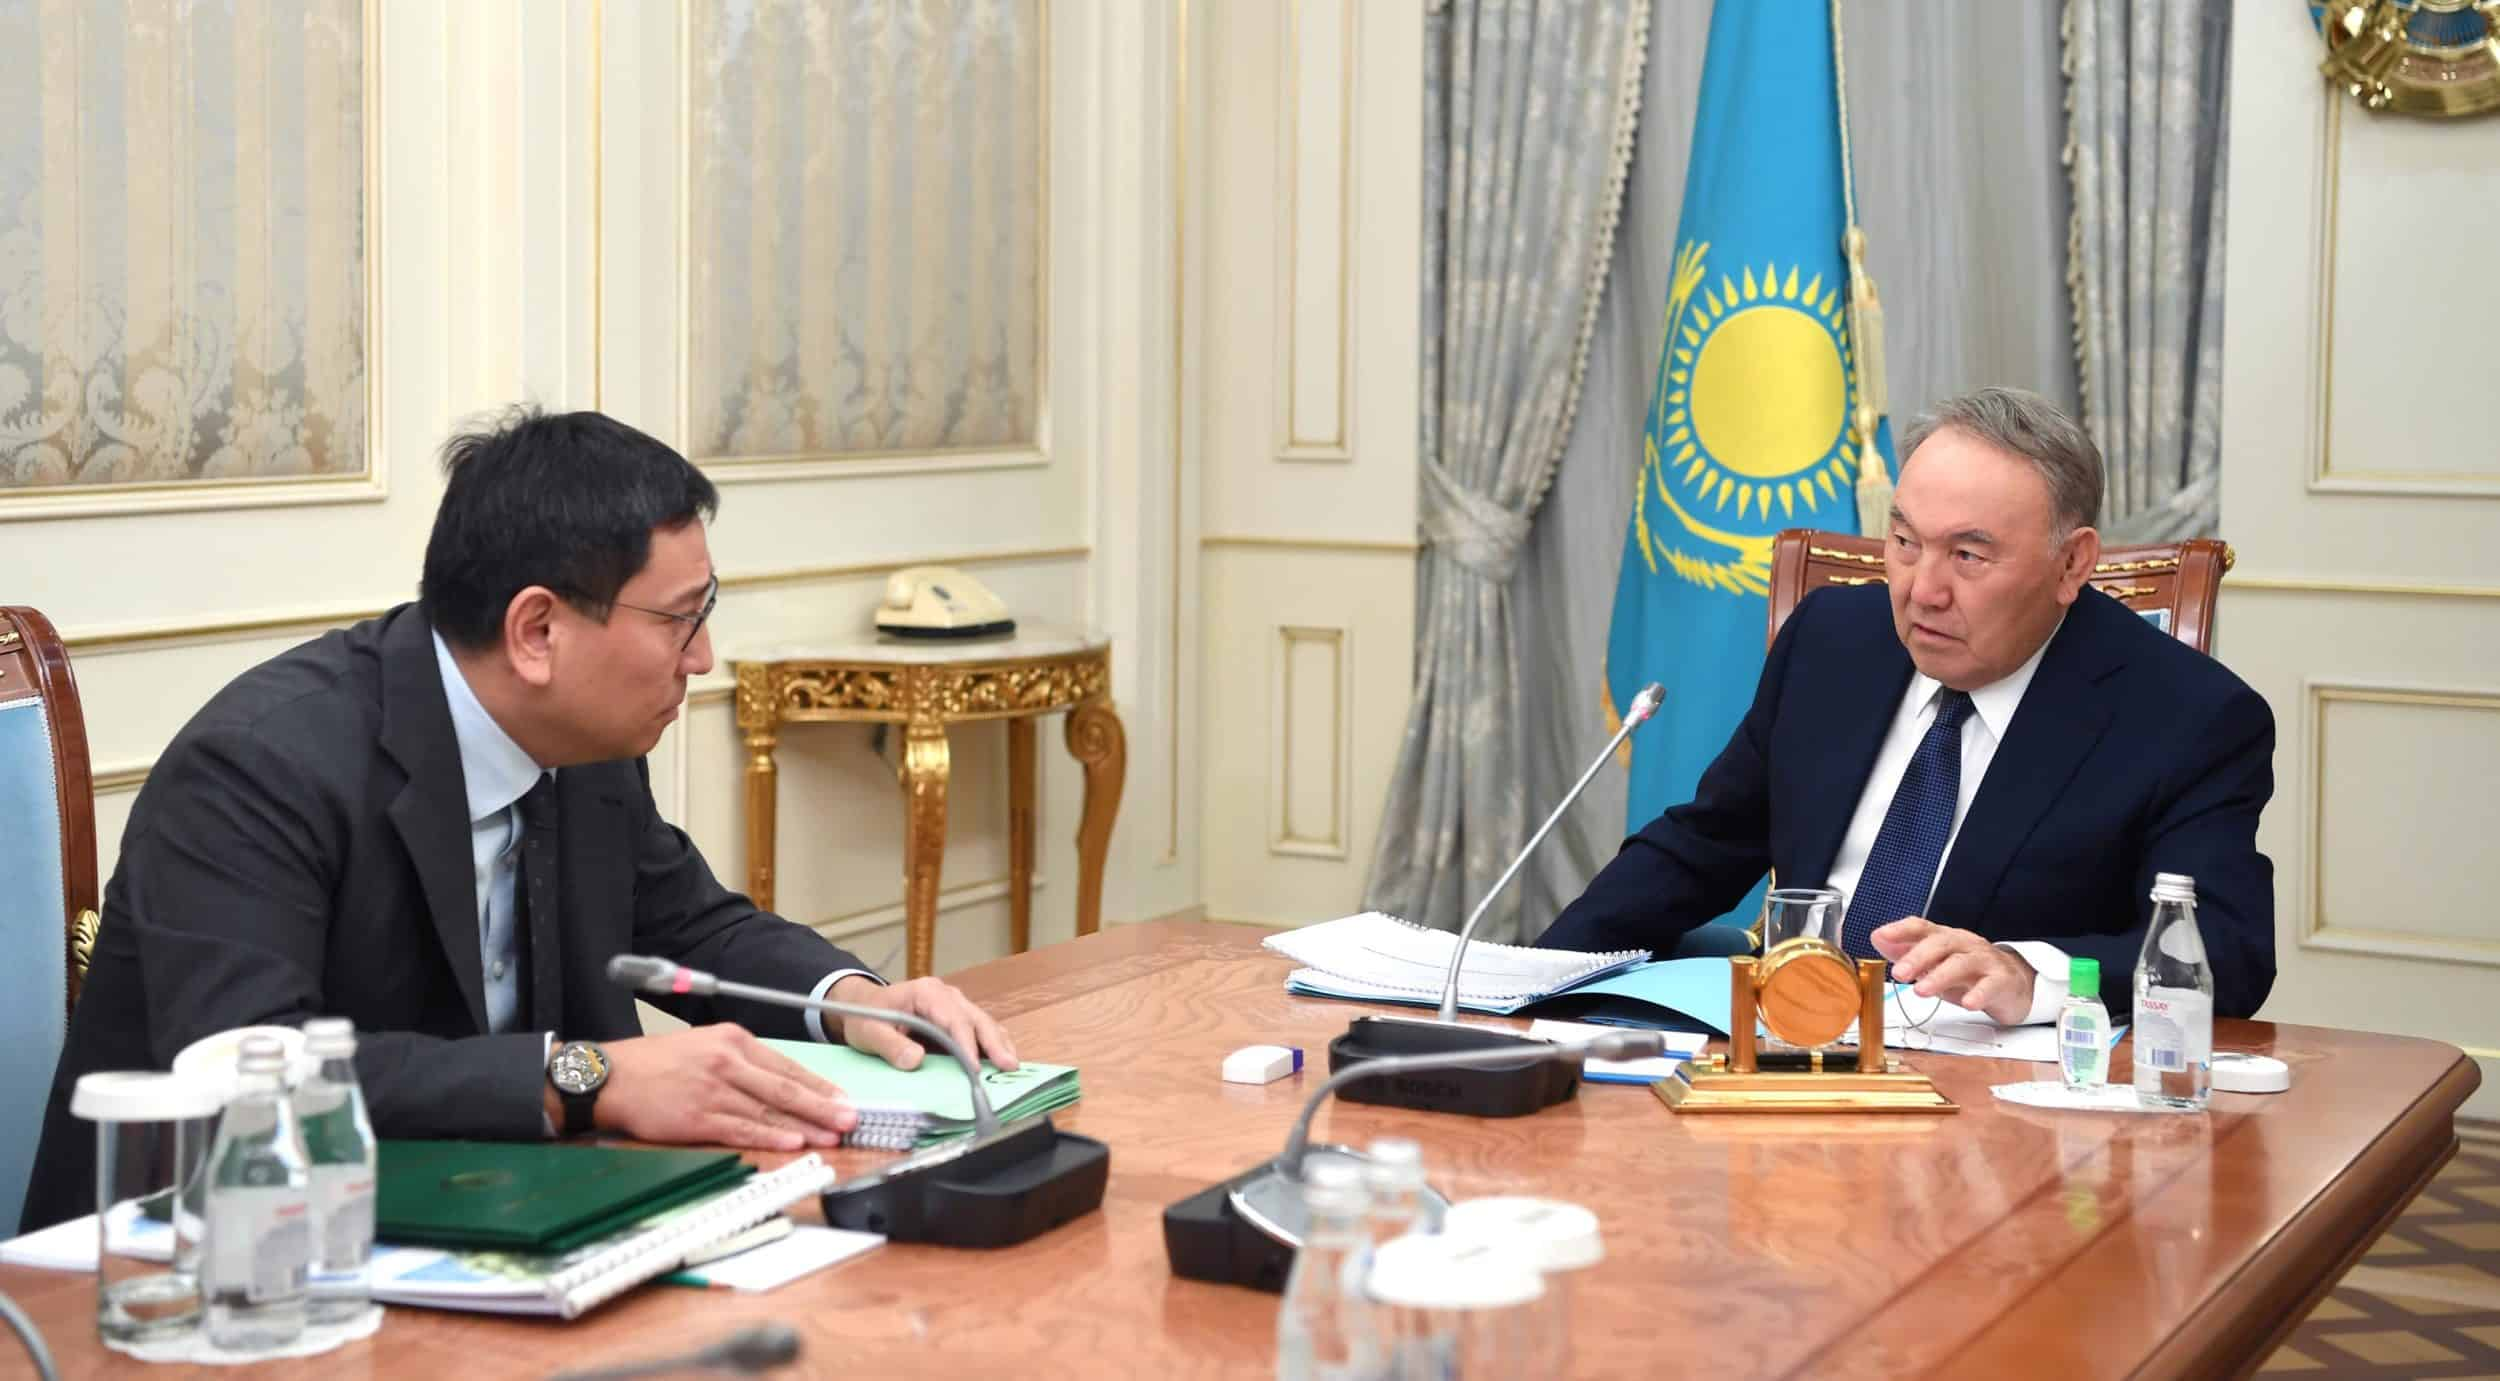 Нұрсұлтан Назарбаев пен Ерболат Досаев